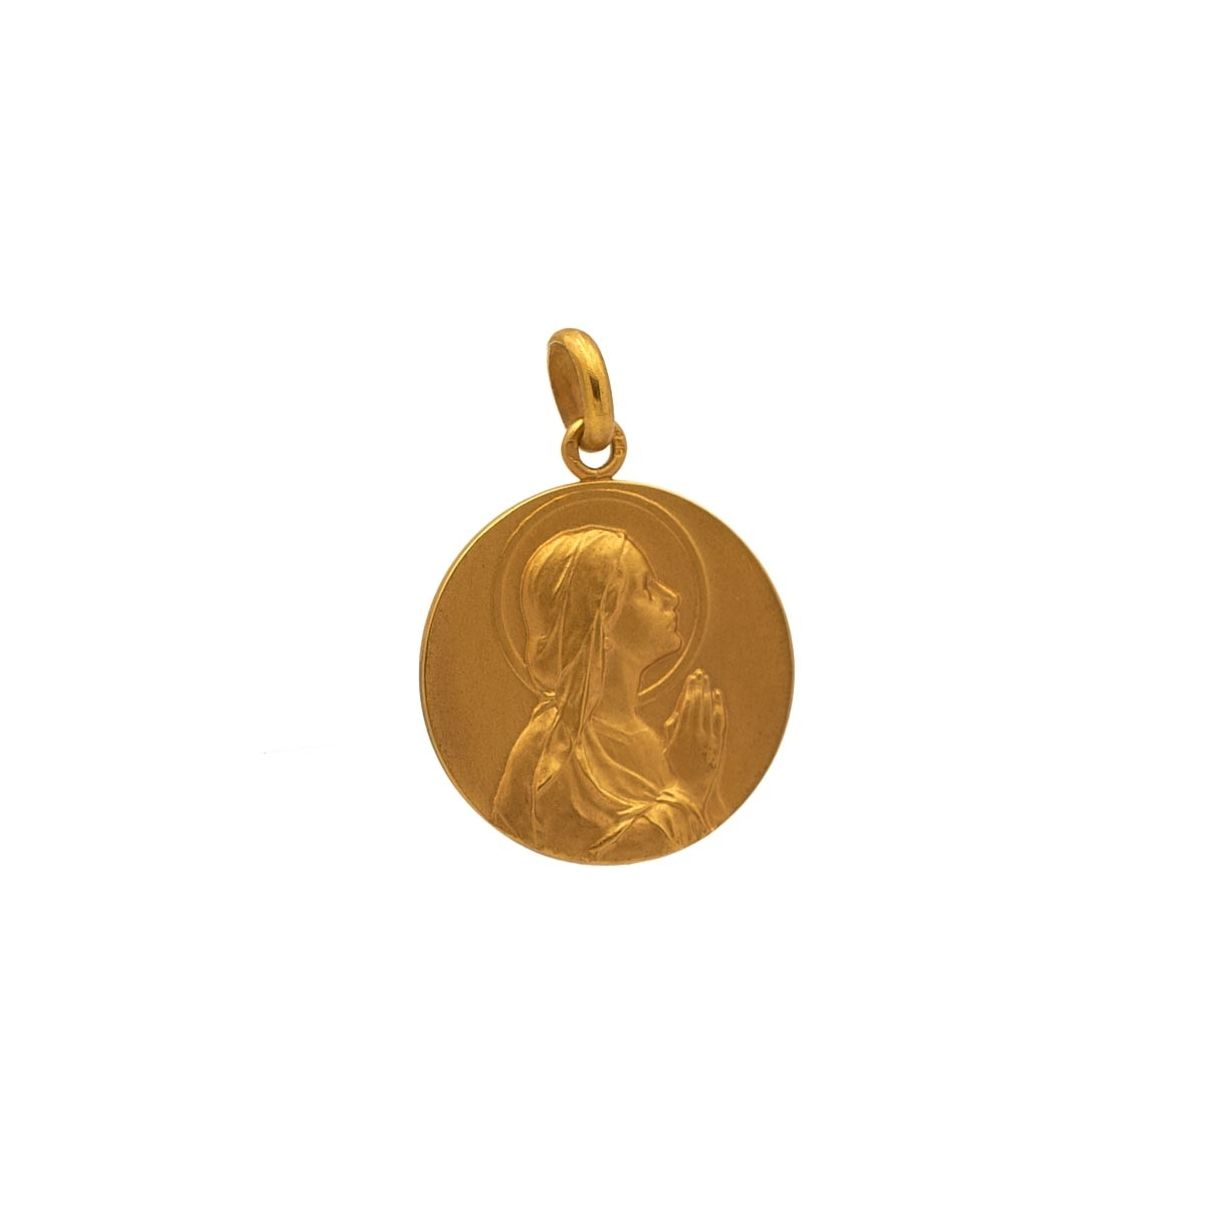 Medalla con imagen de Virgen niña  - 1